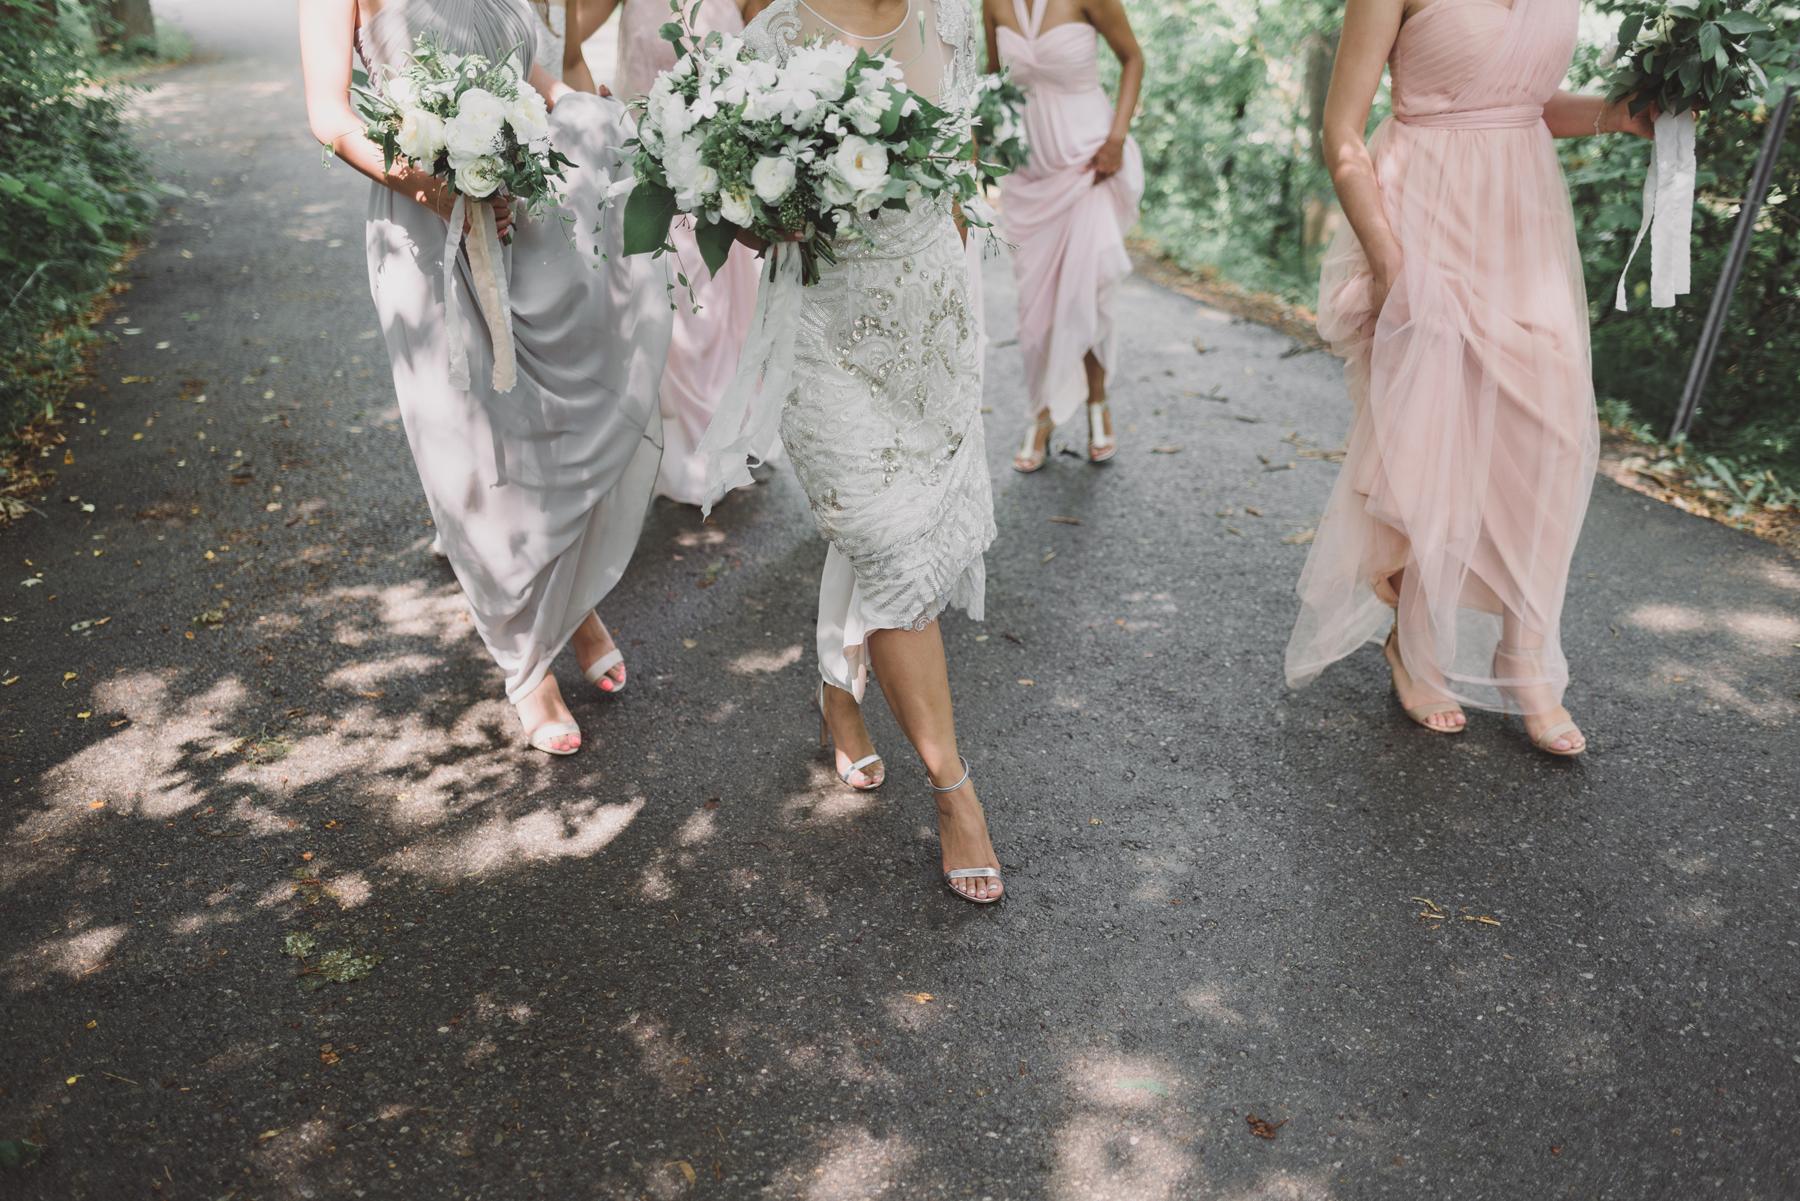 LVImagery-WeddingBells-DianaSohrab-9.JPG